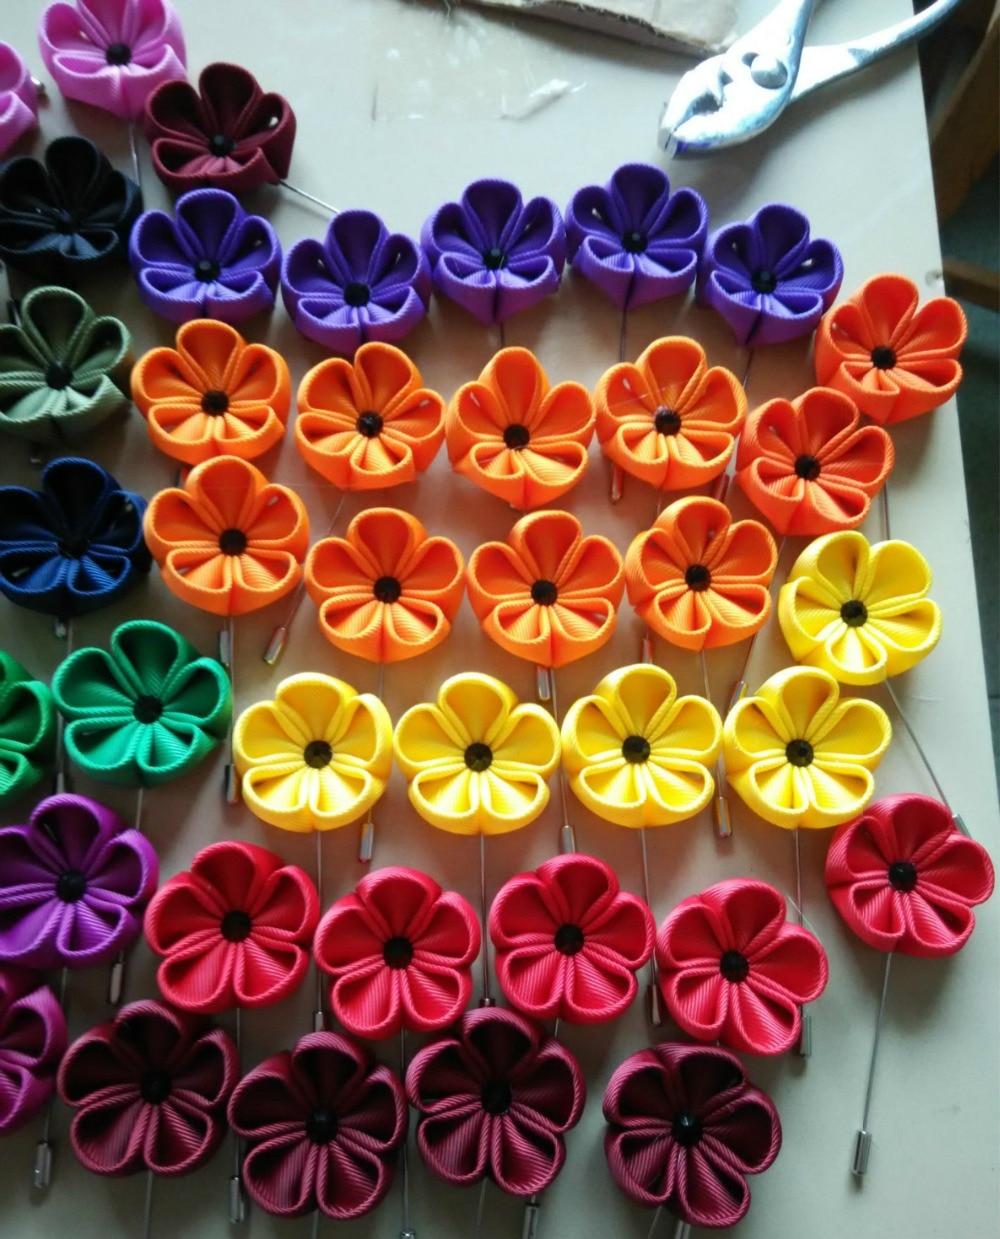 Handmade Kanzashi Flowers Diy Lapel Flower Stick Pins Red Orange